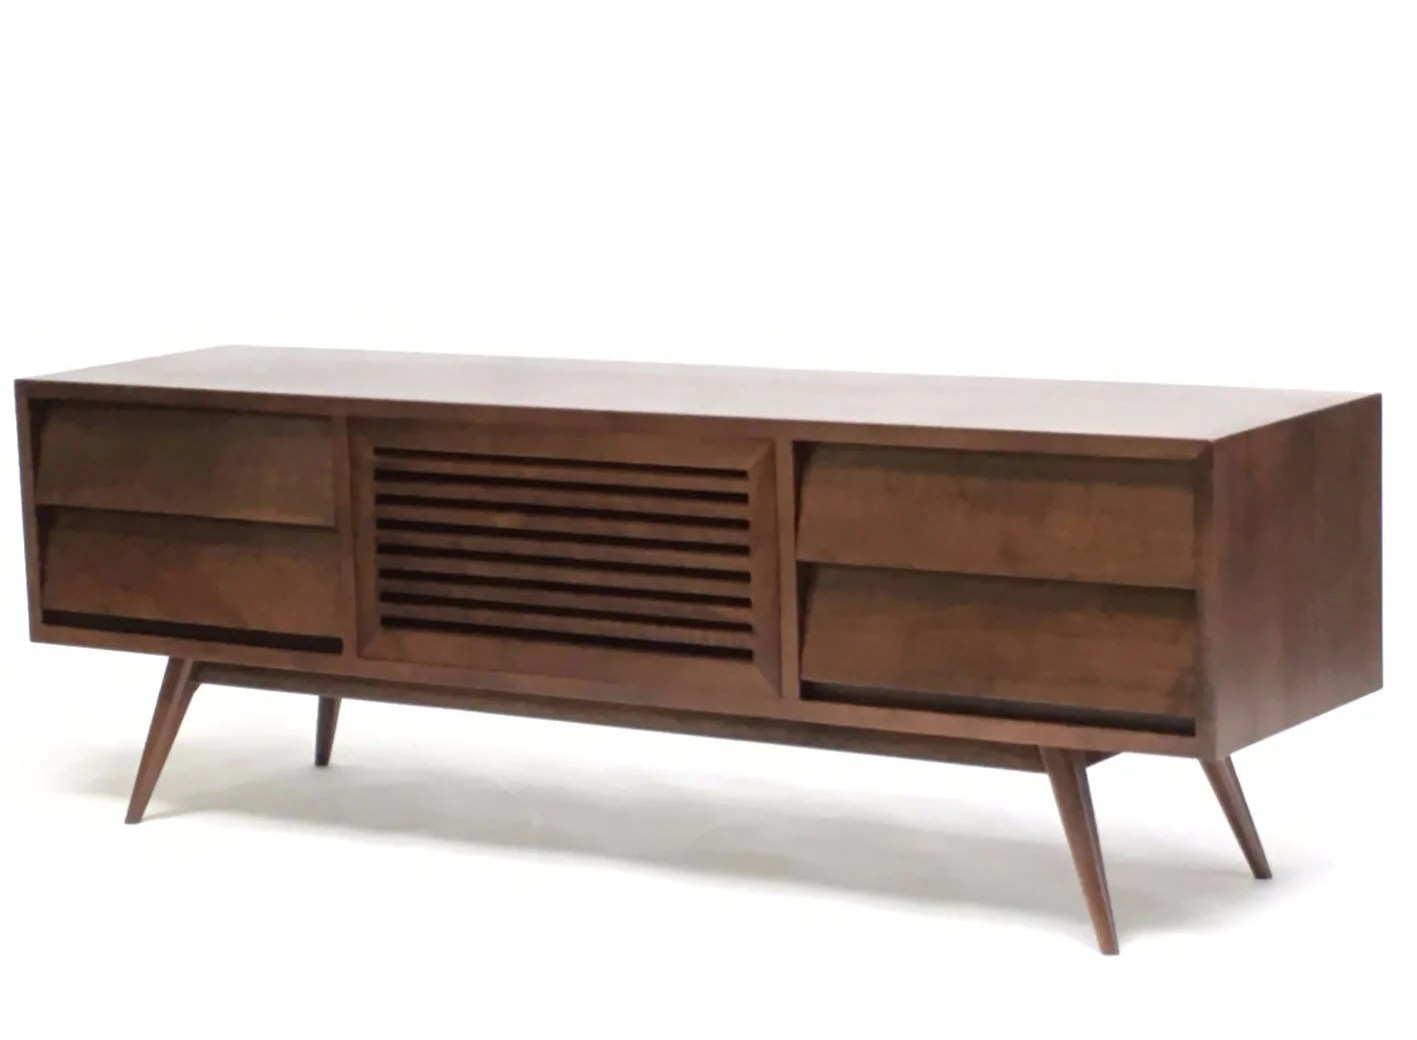 Oslo Solid Walnut Mid Century Modern Tv Cabinet Gingko Gingko Home Furnishings